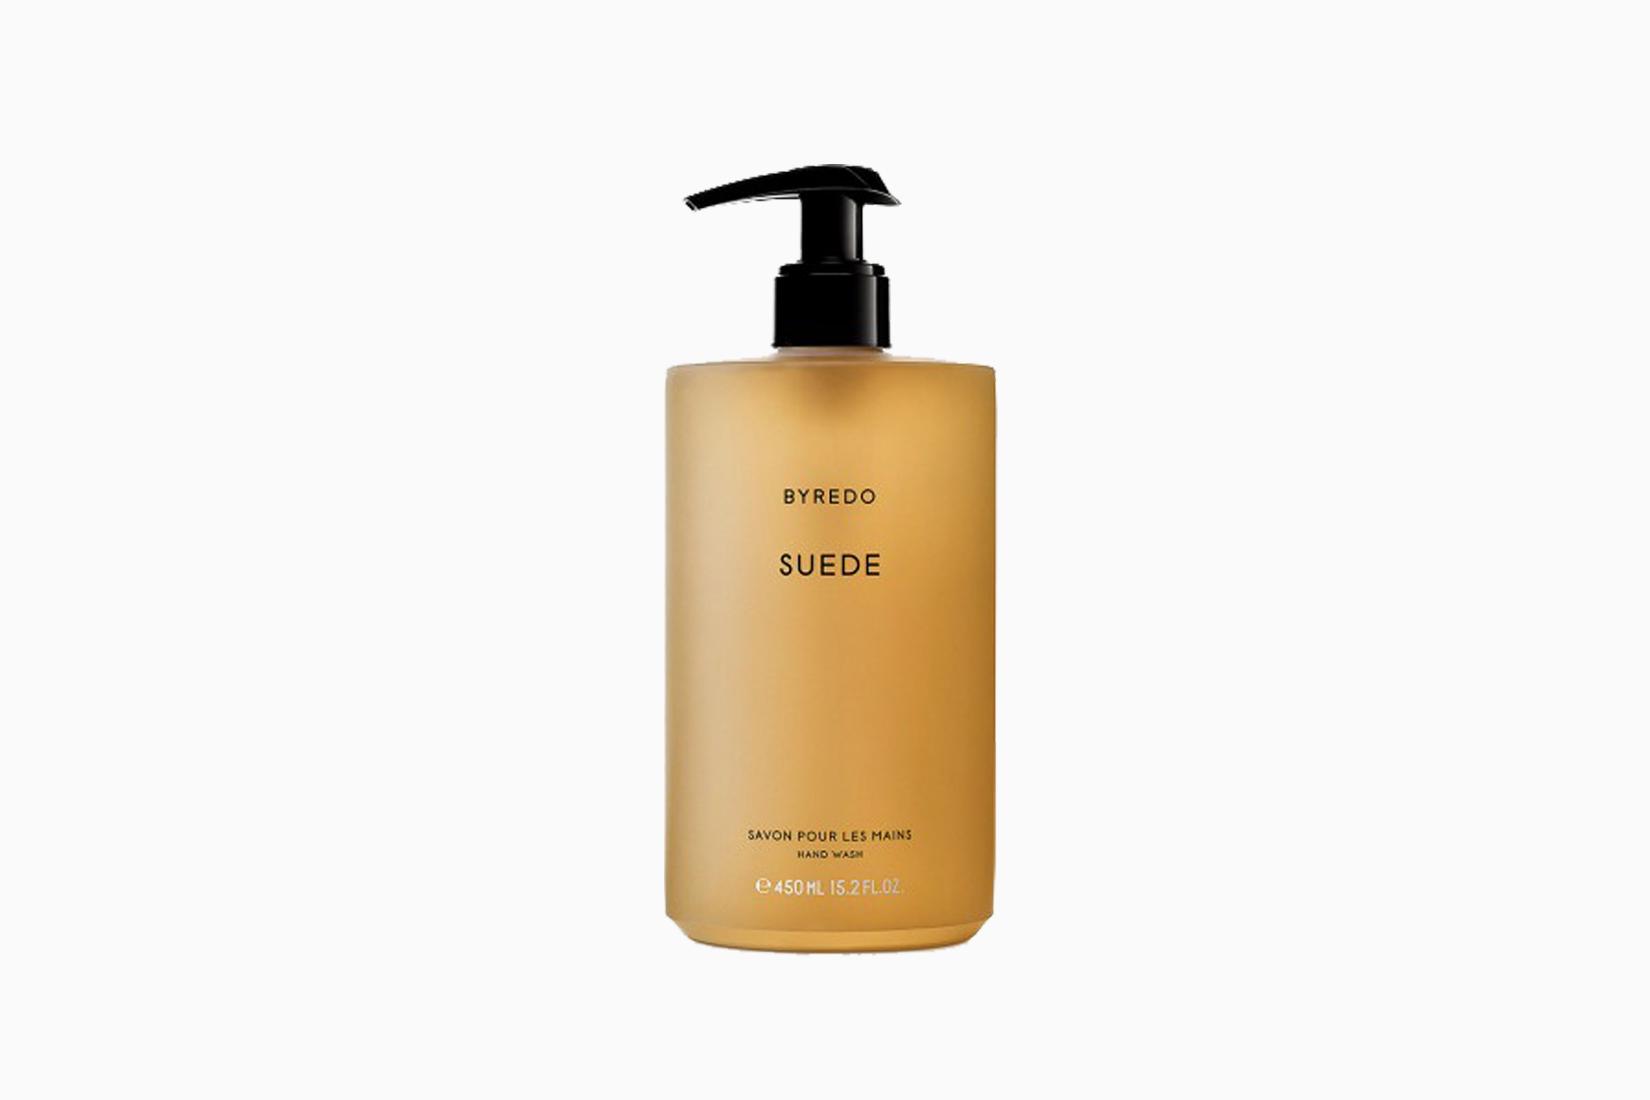 best hand soap byredo review - Luxe Digital